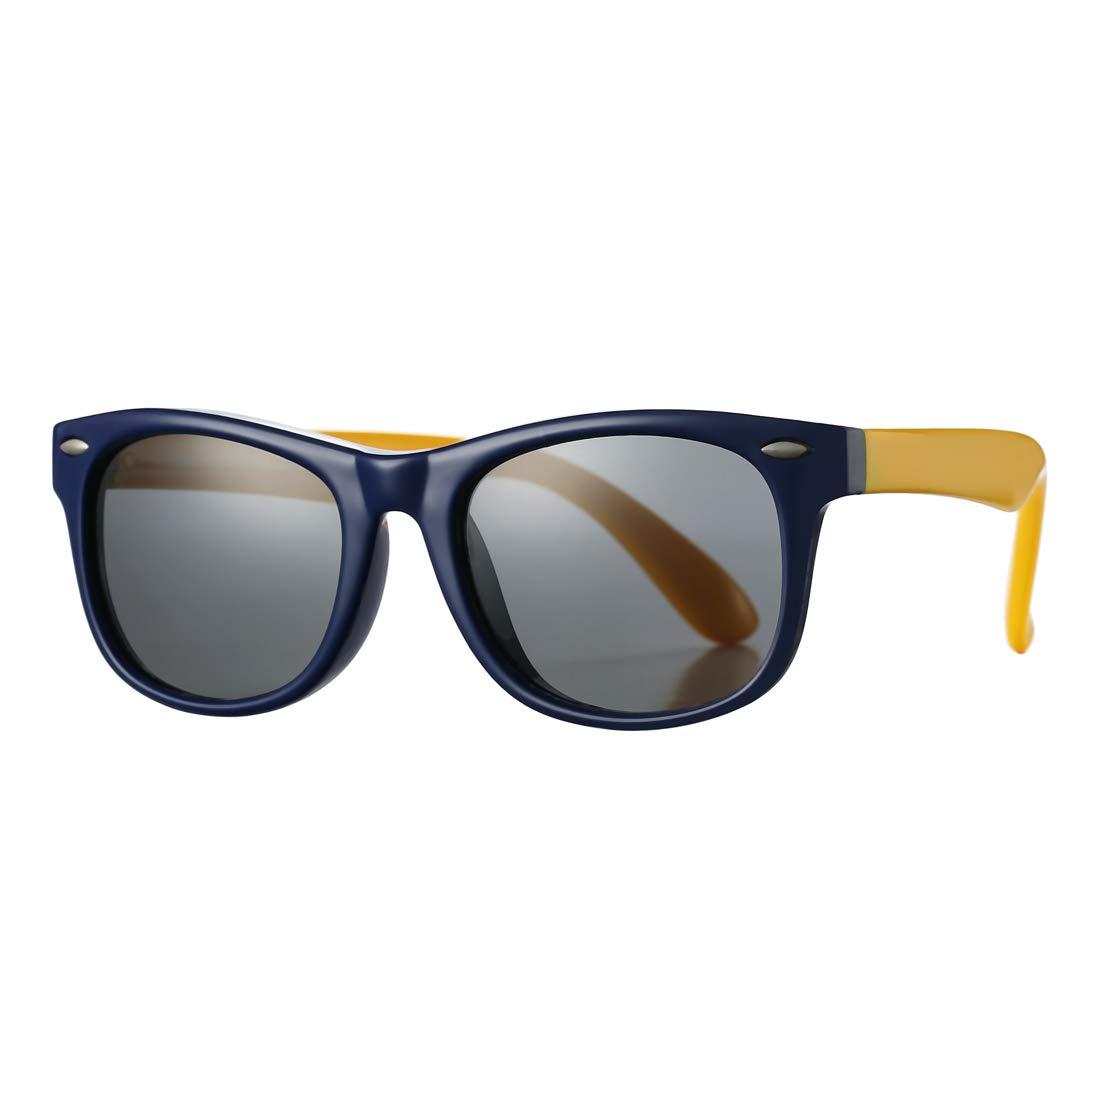 Kids Polarized Sunglasses TPEE Rubber Flexible Shades for Girls Boys Age 3-10 (Blue Frame/Grey Lens)